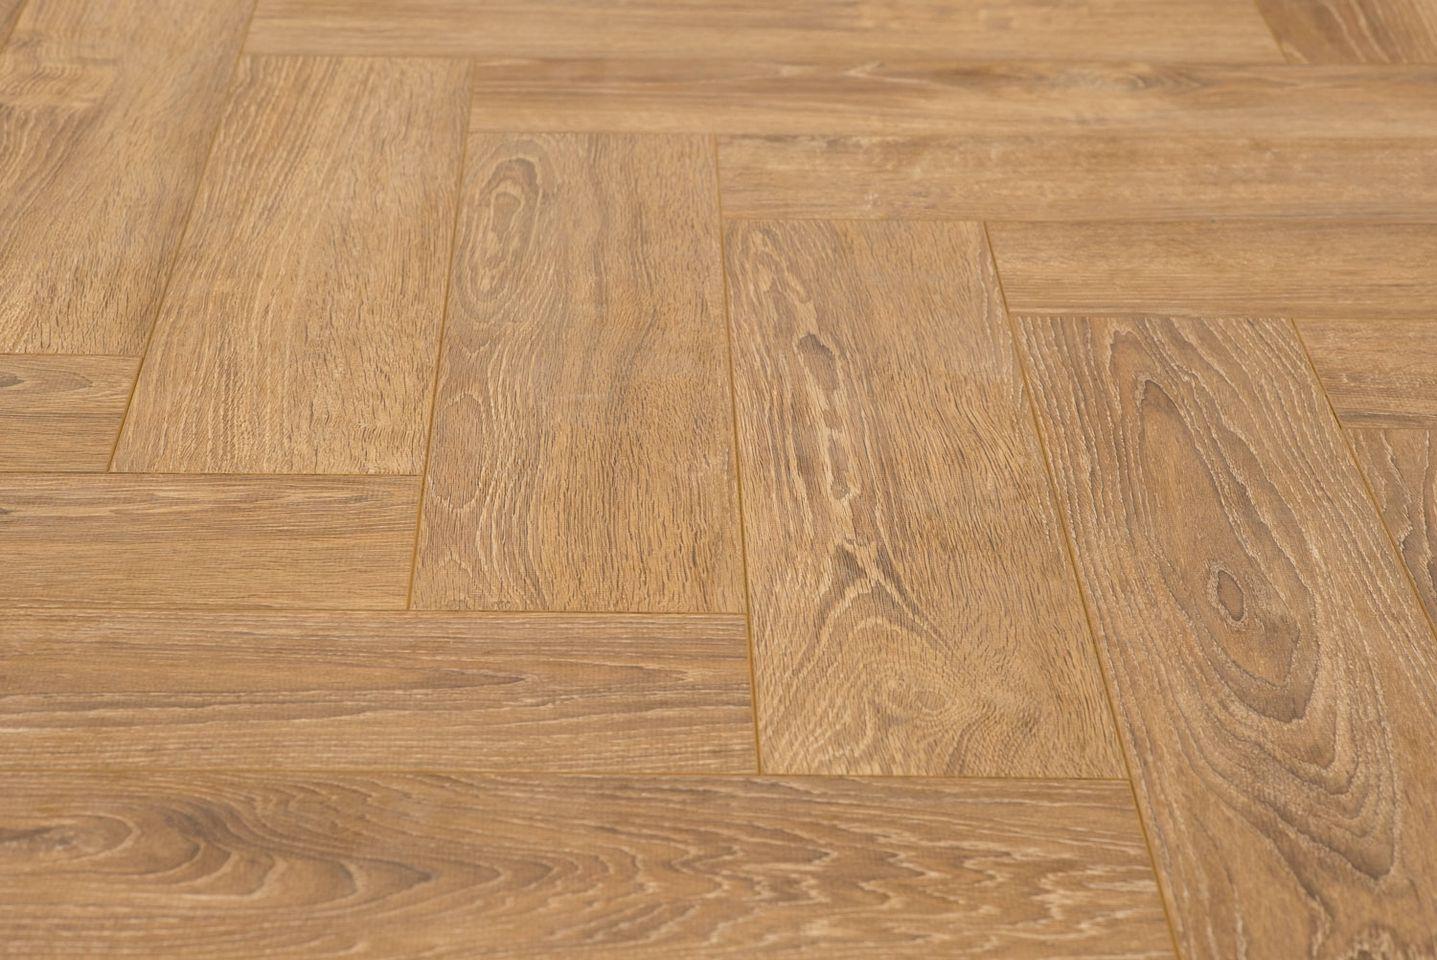 Visgraat Laminaat Leggen : Floer visgraat laminaat gerookt eiken vloer patroon eik bruin